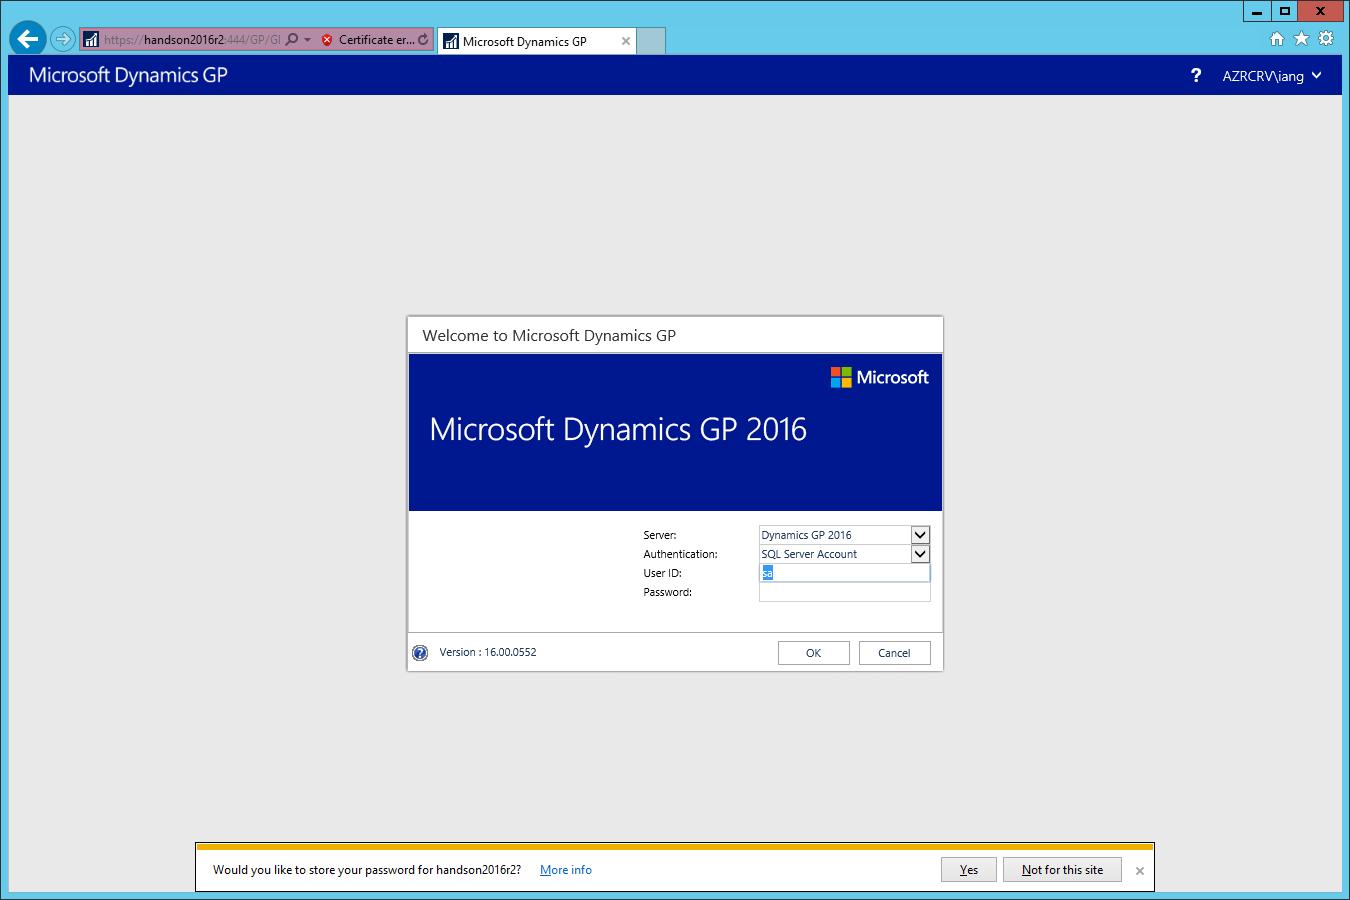 Welcome to Microsoft Dynamics GP